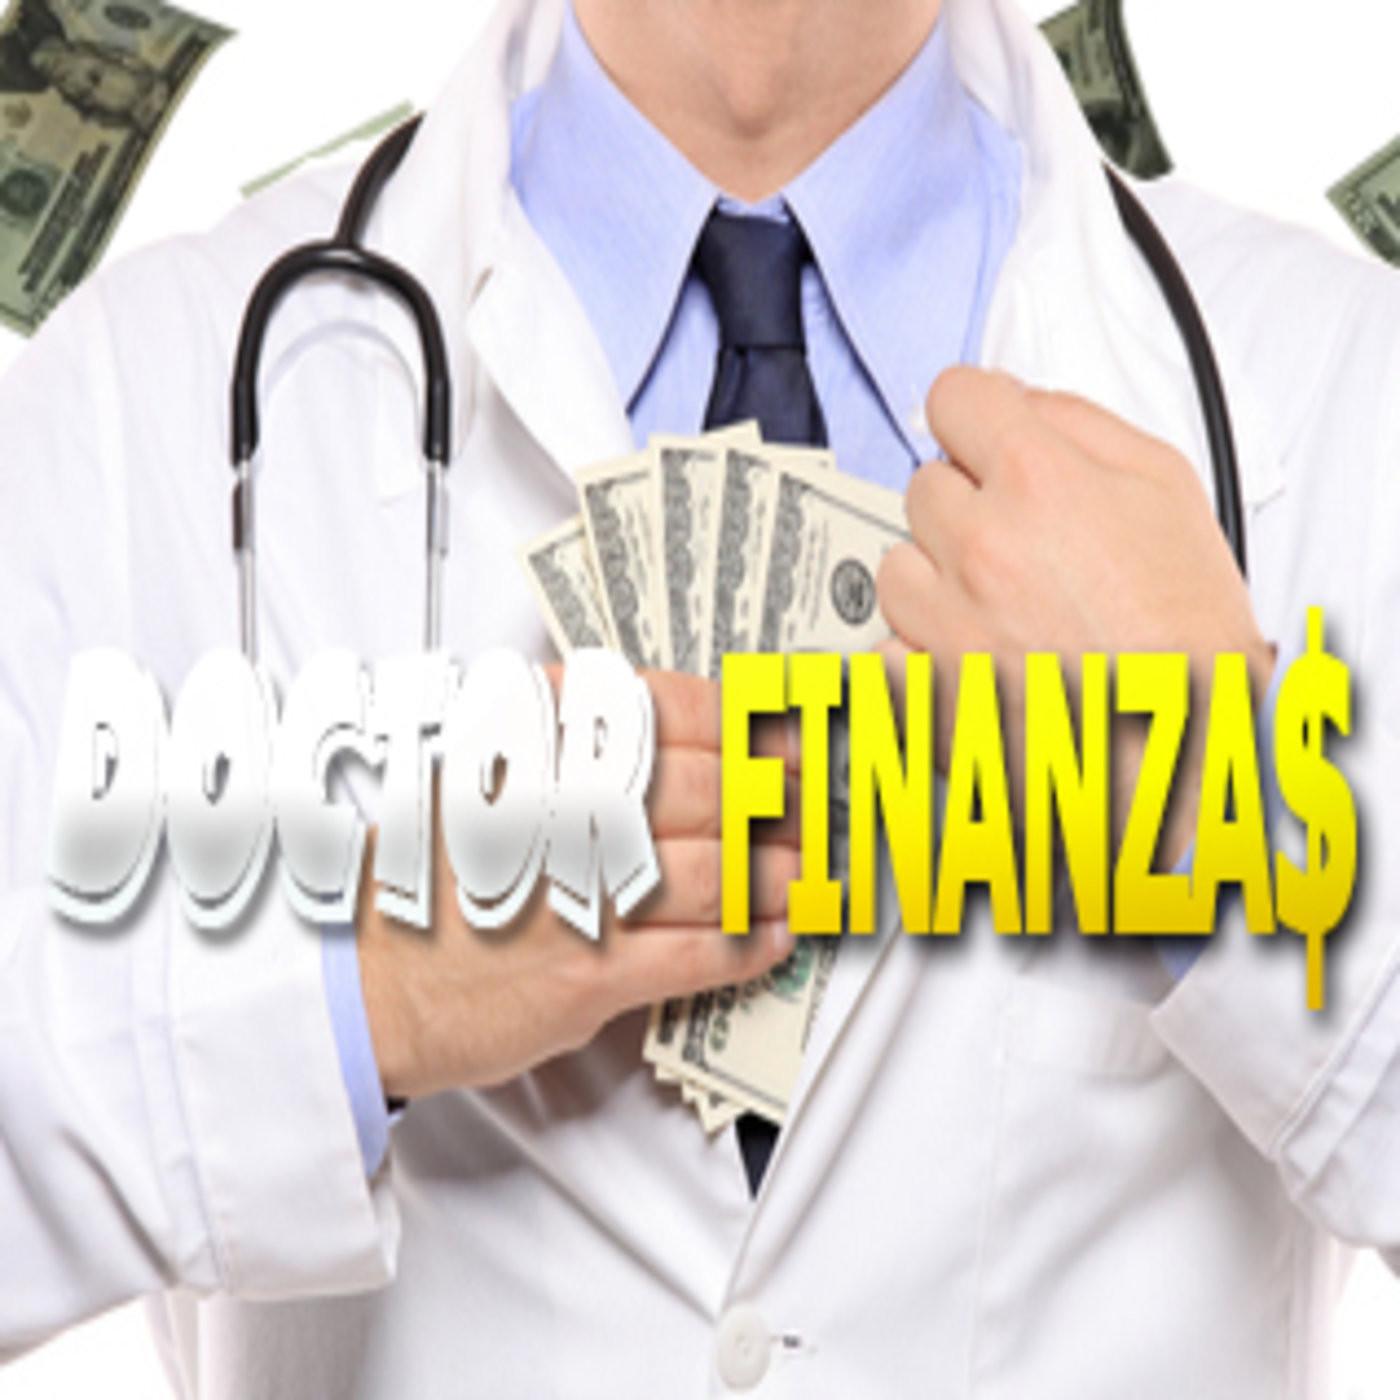 <![CDATA[Dr.Finanzas]]>